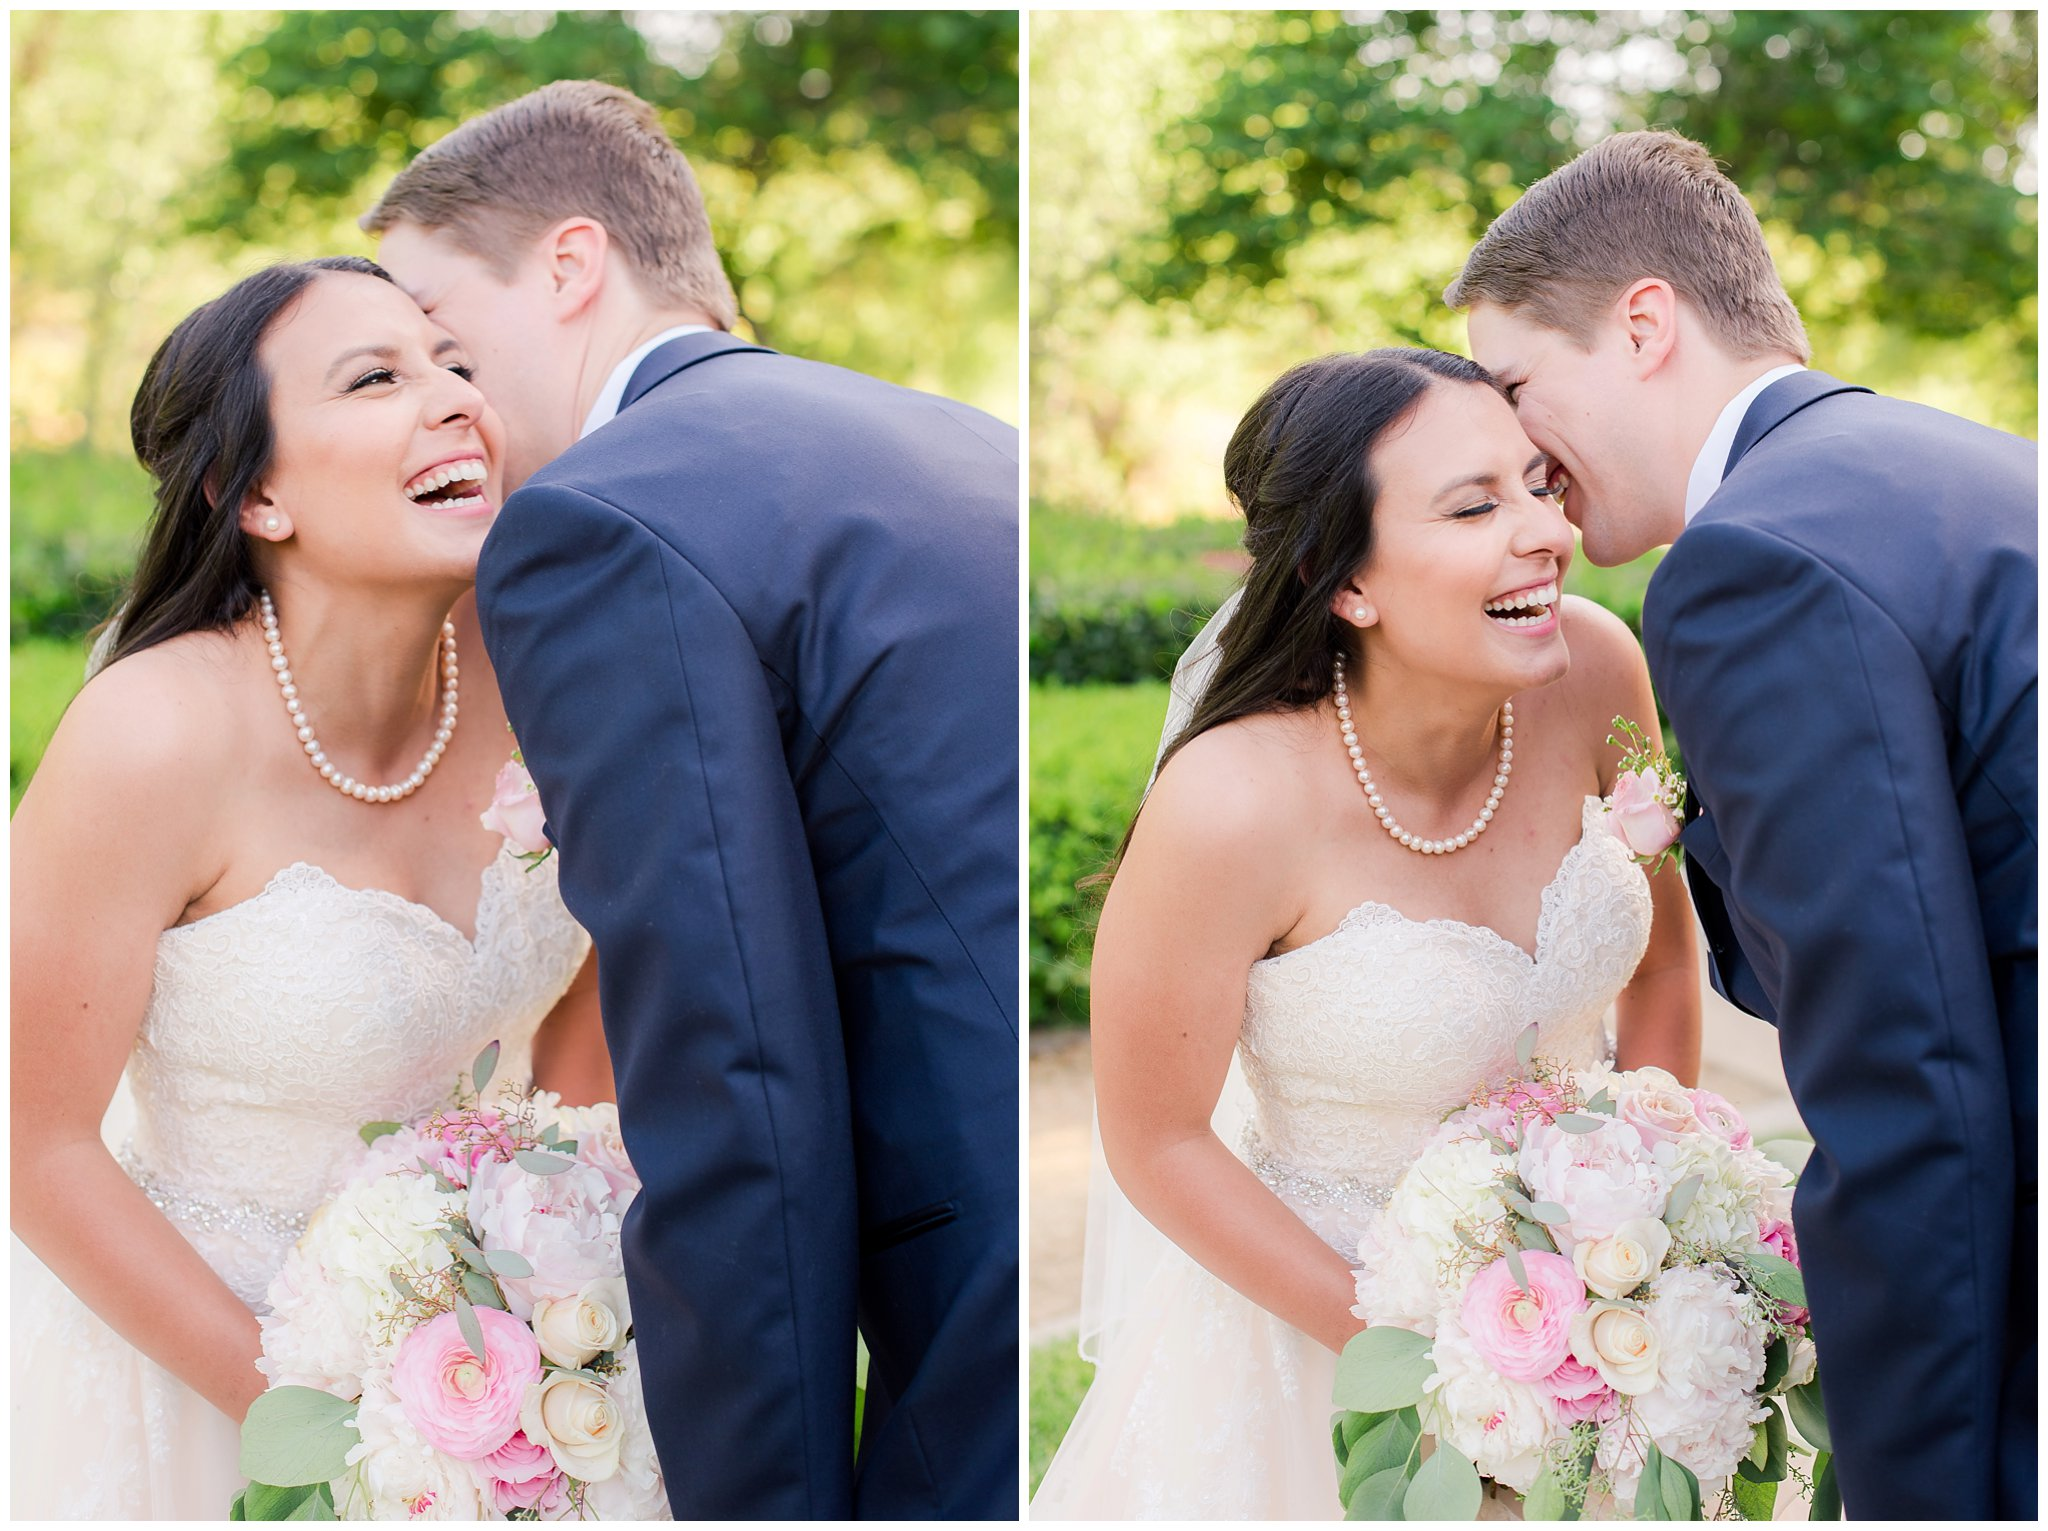 David-Girard-Vineyards-Wedding-Wedgewood-Weddings-51.jpg